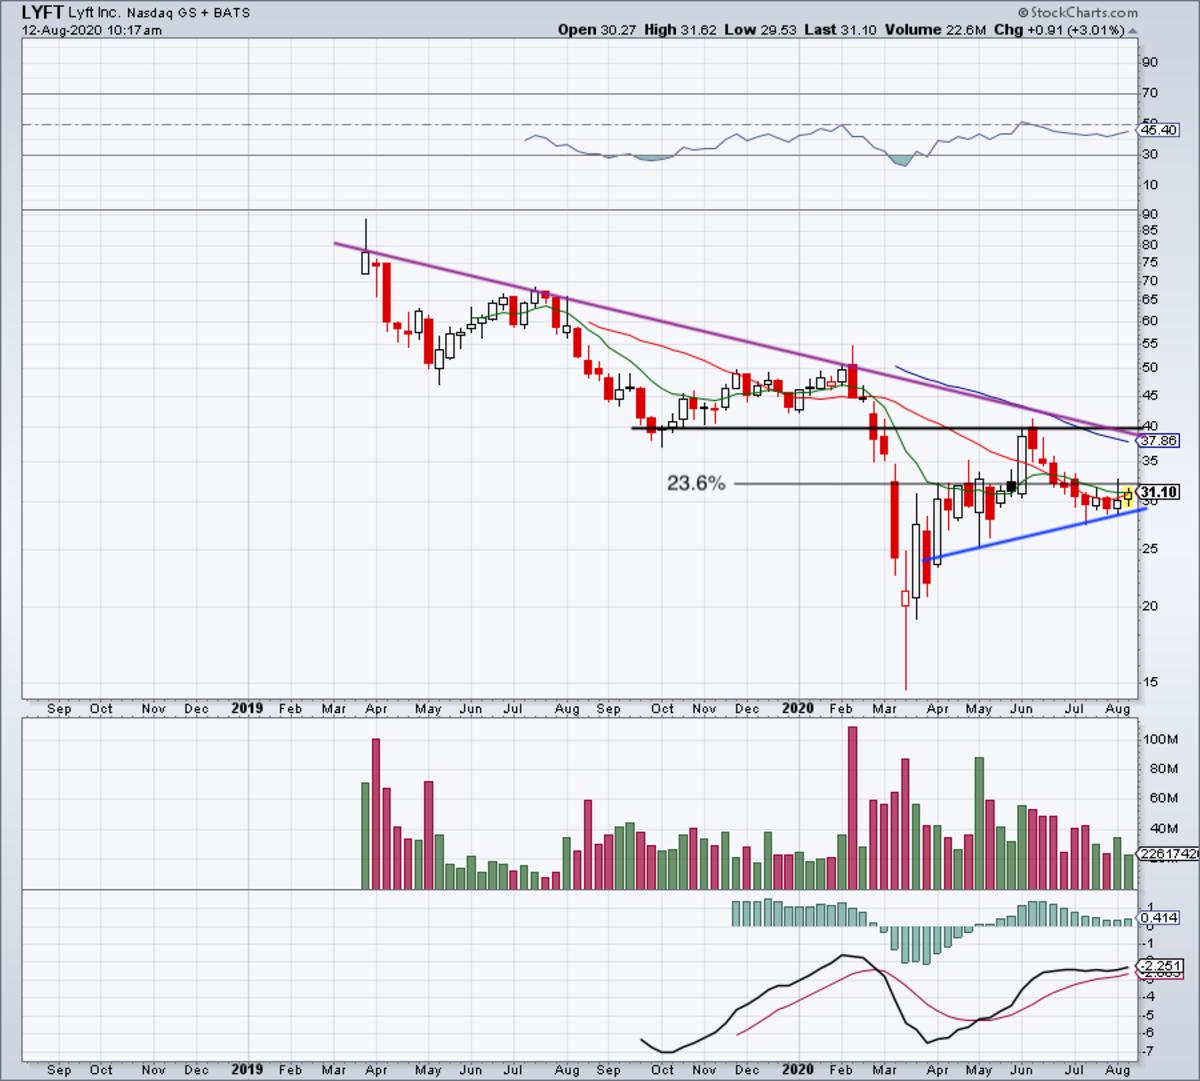 Daily chart of Lyft stock.